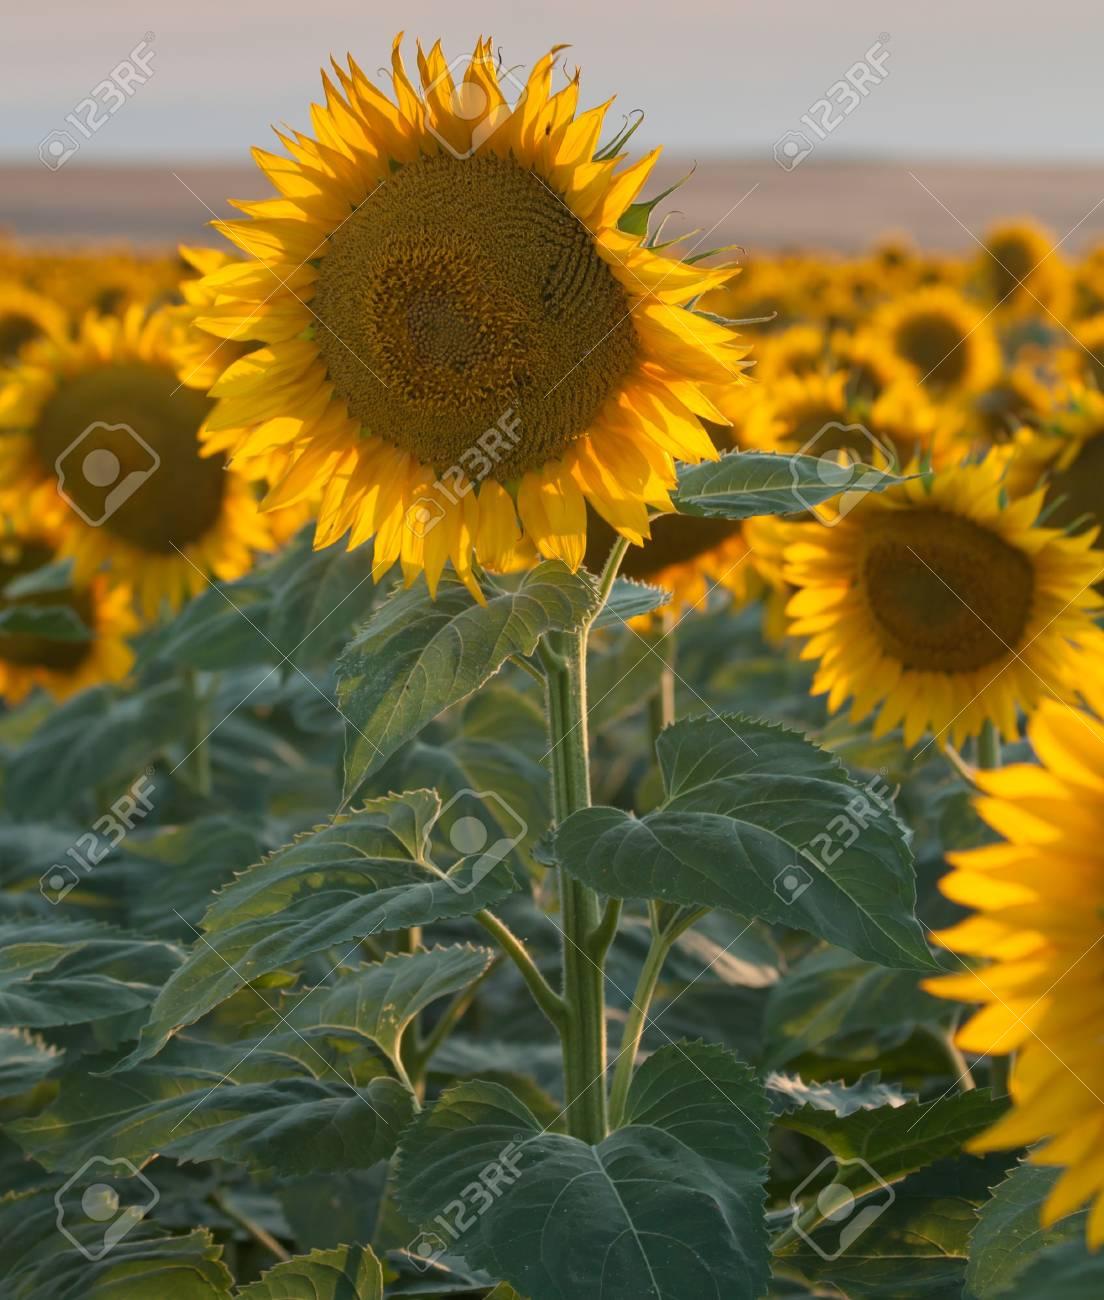 Sunflower Fields in Summer Stock Photo - 18809737